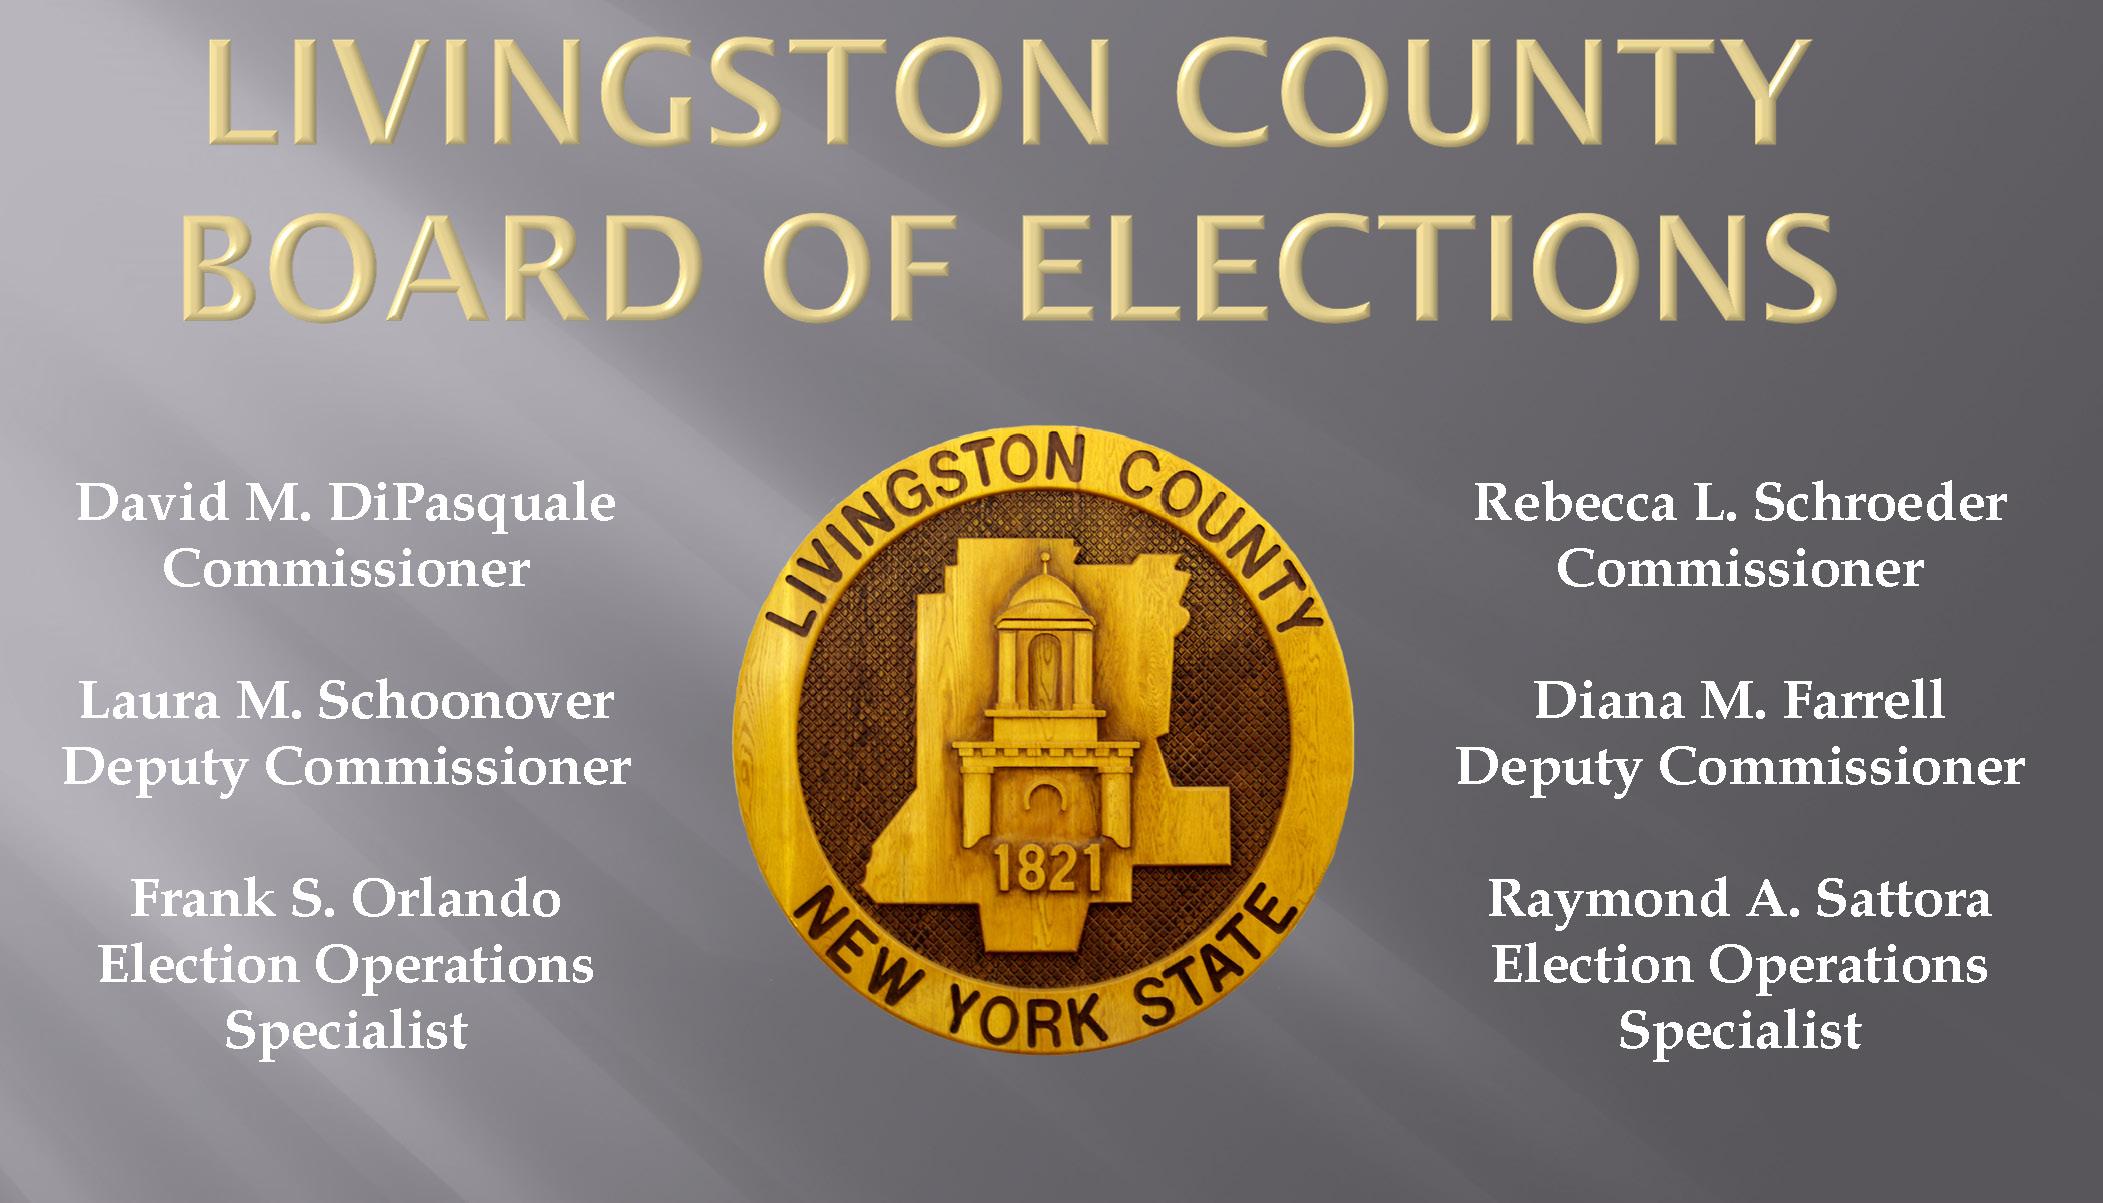 New york livingston county leicester - Department Head Meeting Jpg